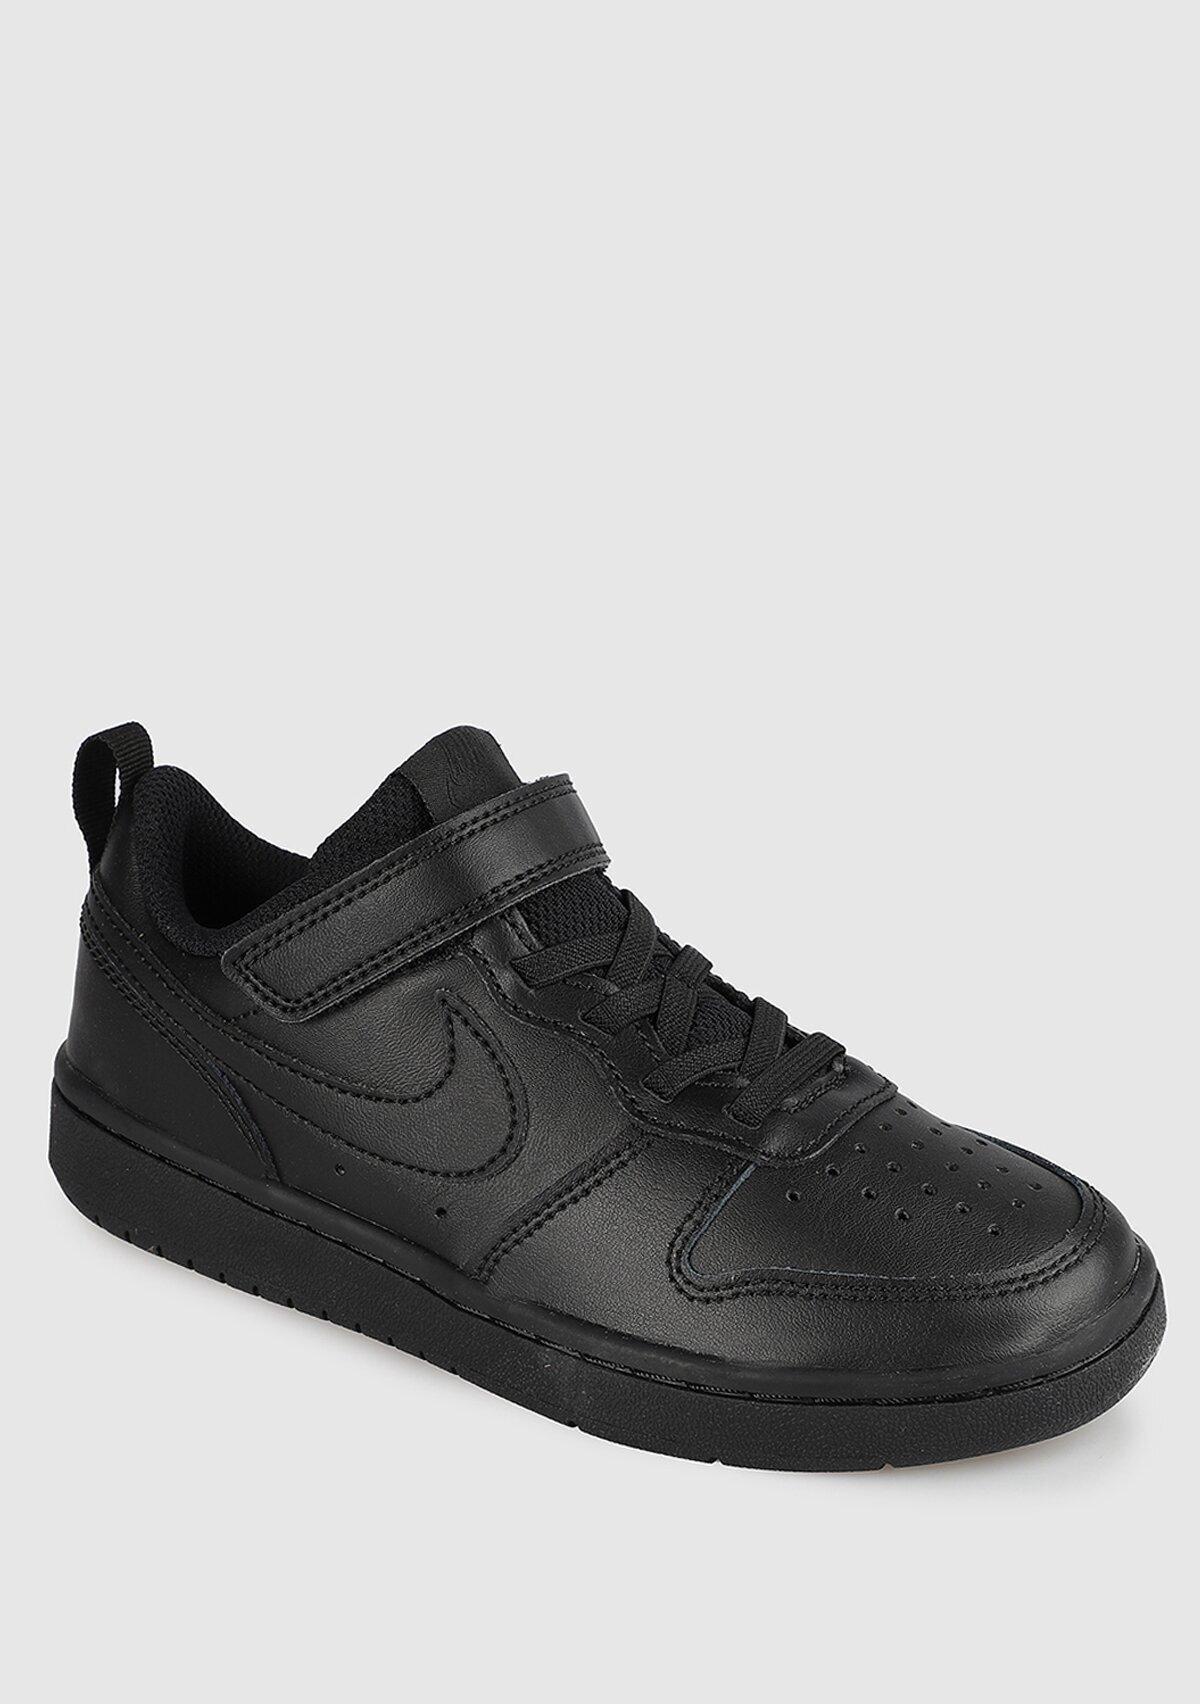 resm Court Borough Low Siyah Unisex Basketbol Ayakkabısı Bq5451-001